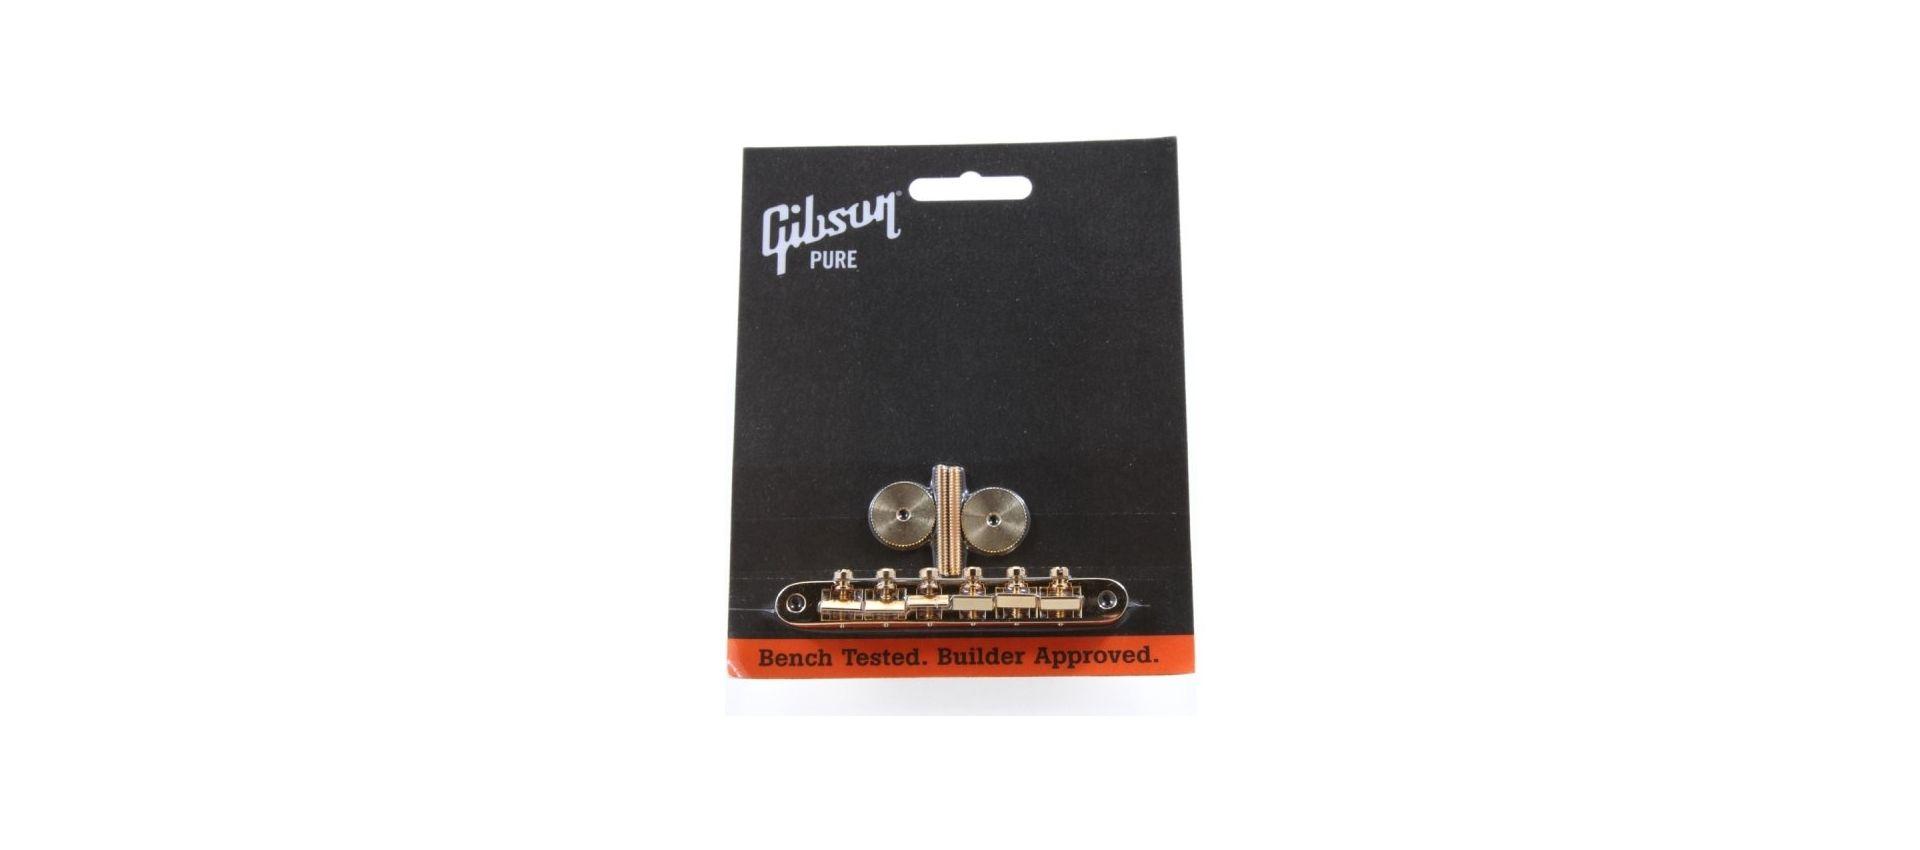 Gibson pbbr-020 gold abr-1 bridge w/full assembly: Hardware vario